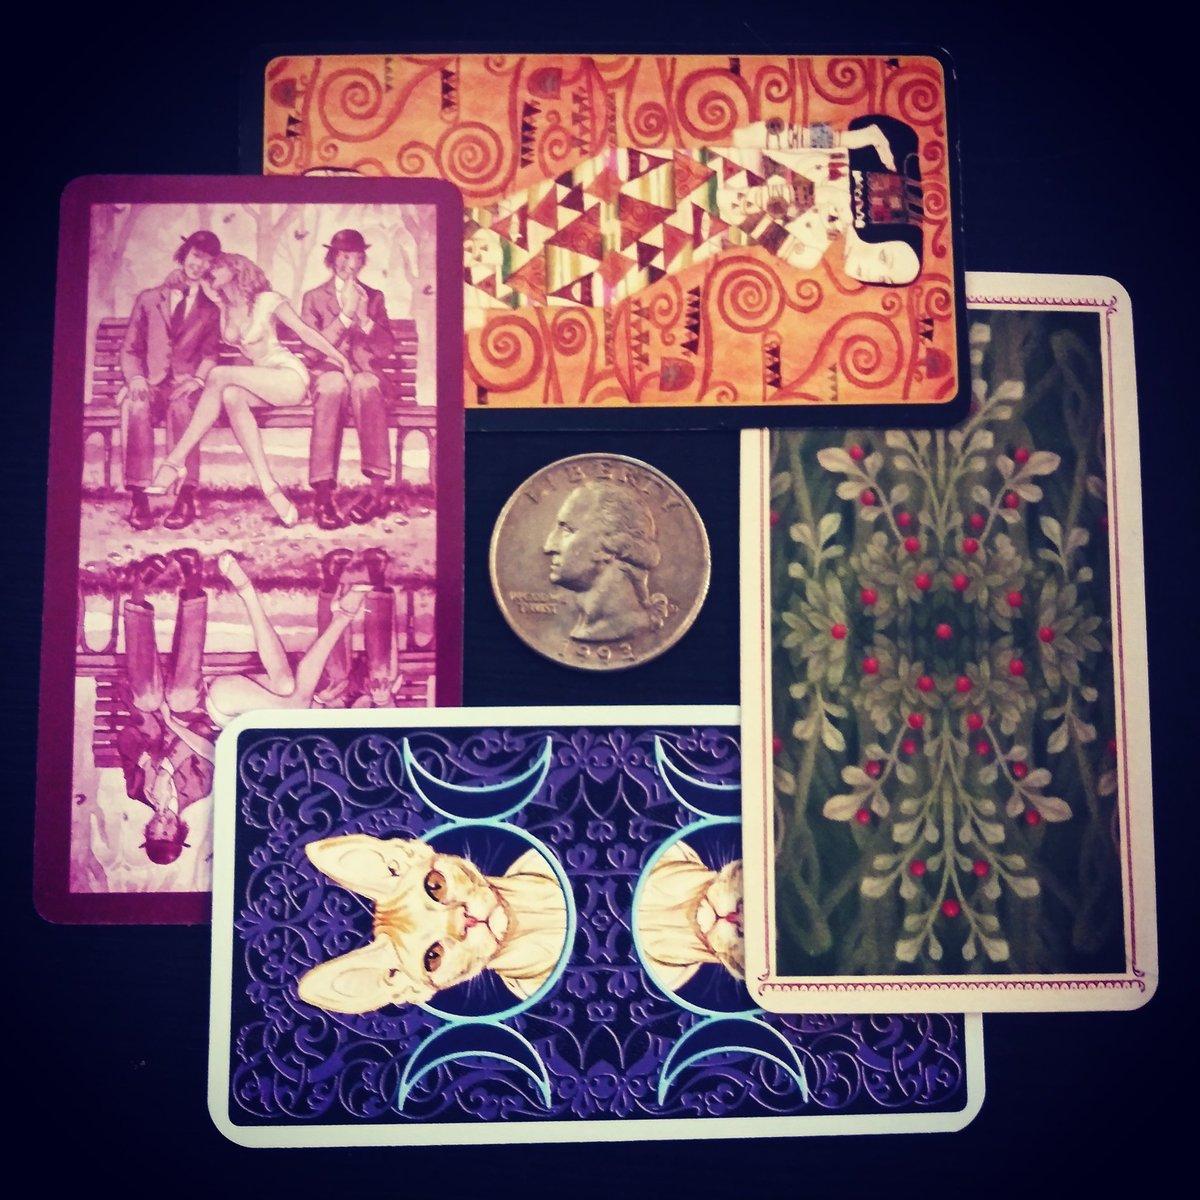 My #mini #tarot collection 😍